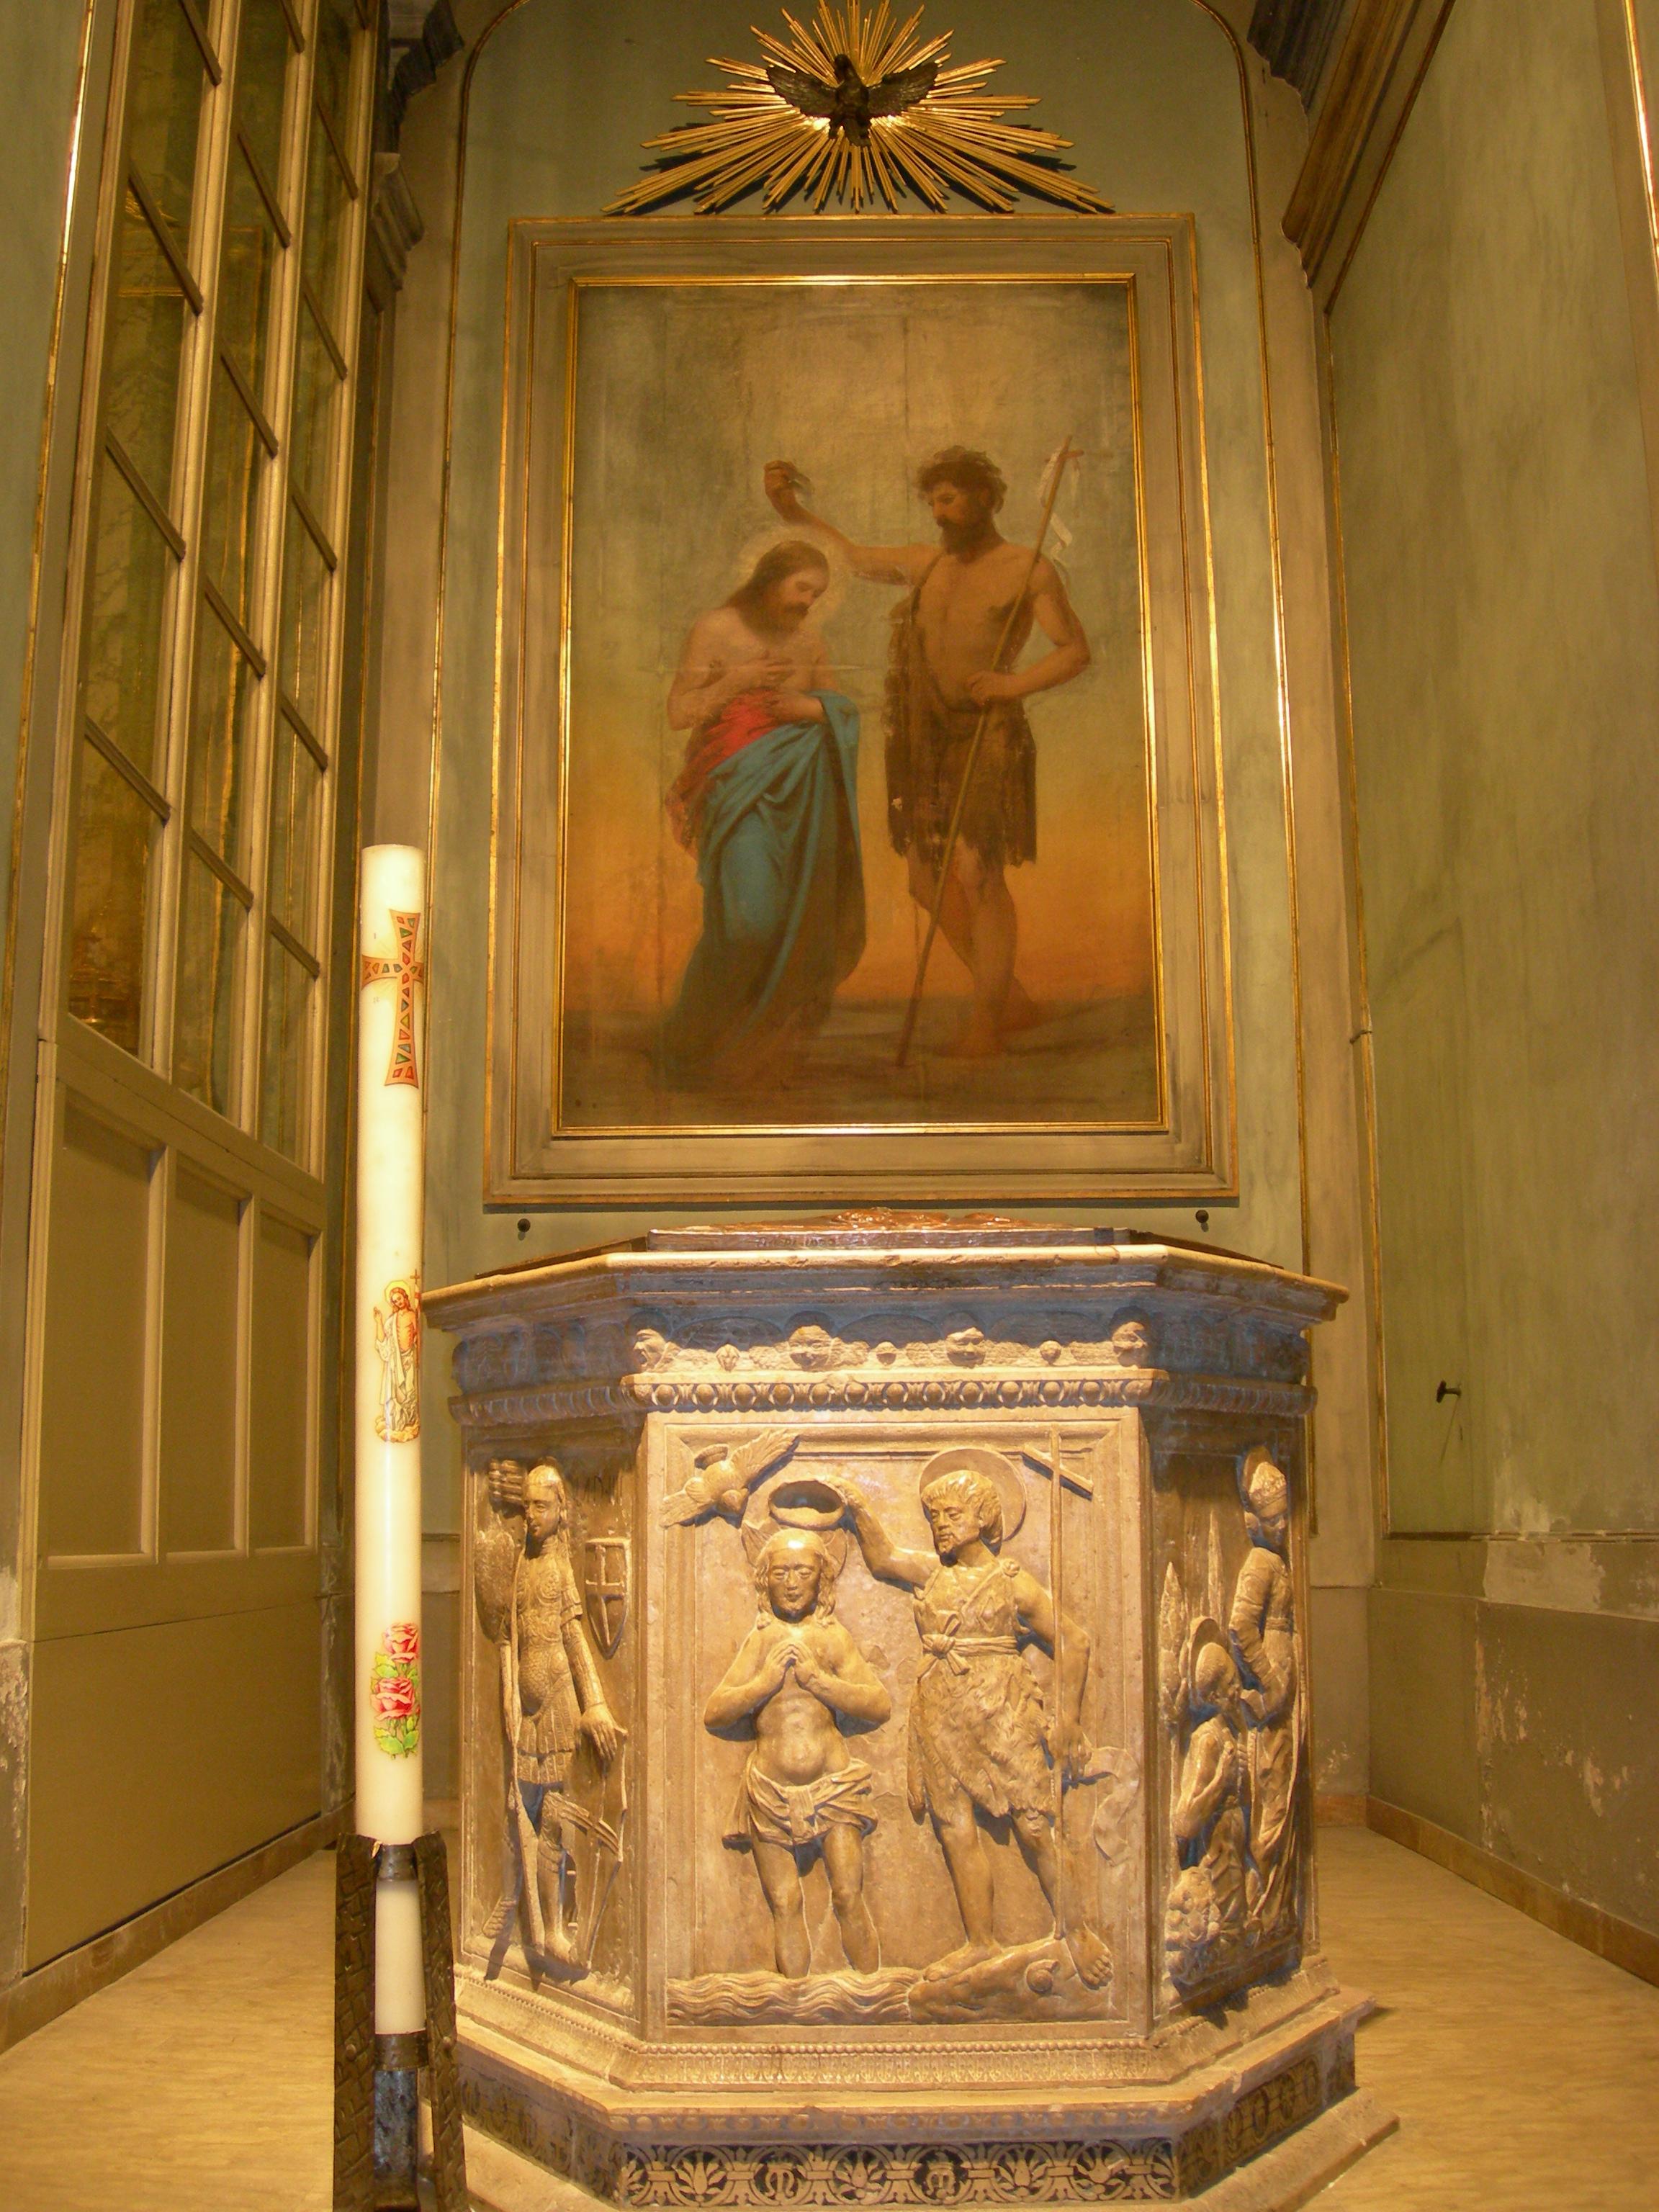 Pia Bautismal donde Madre Clelia fue bautizada